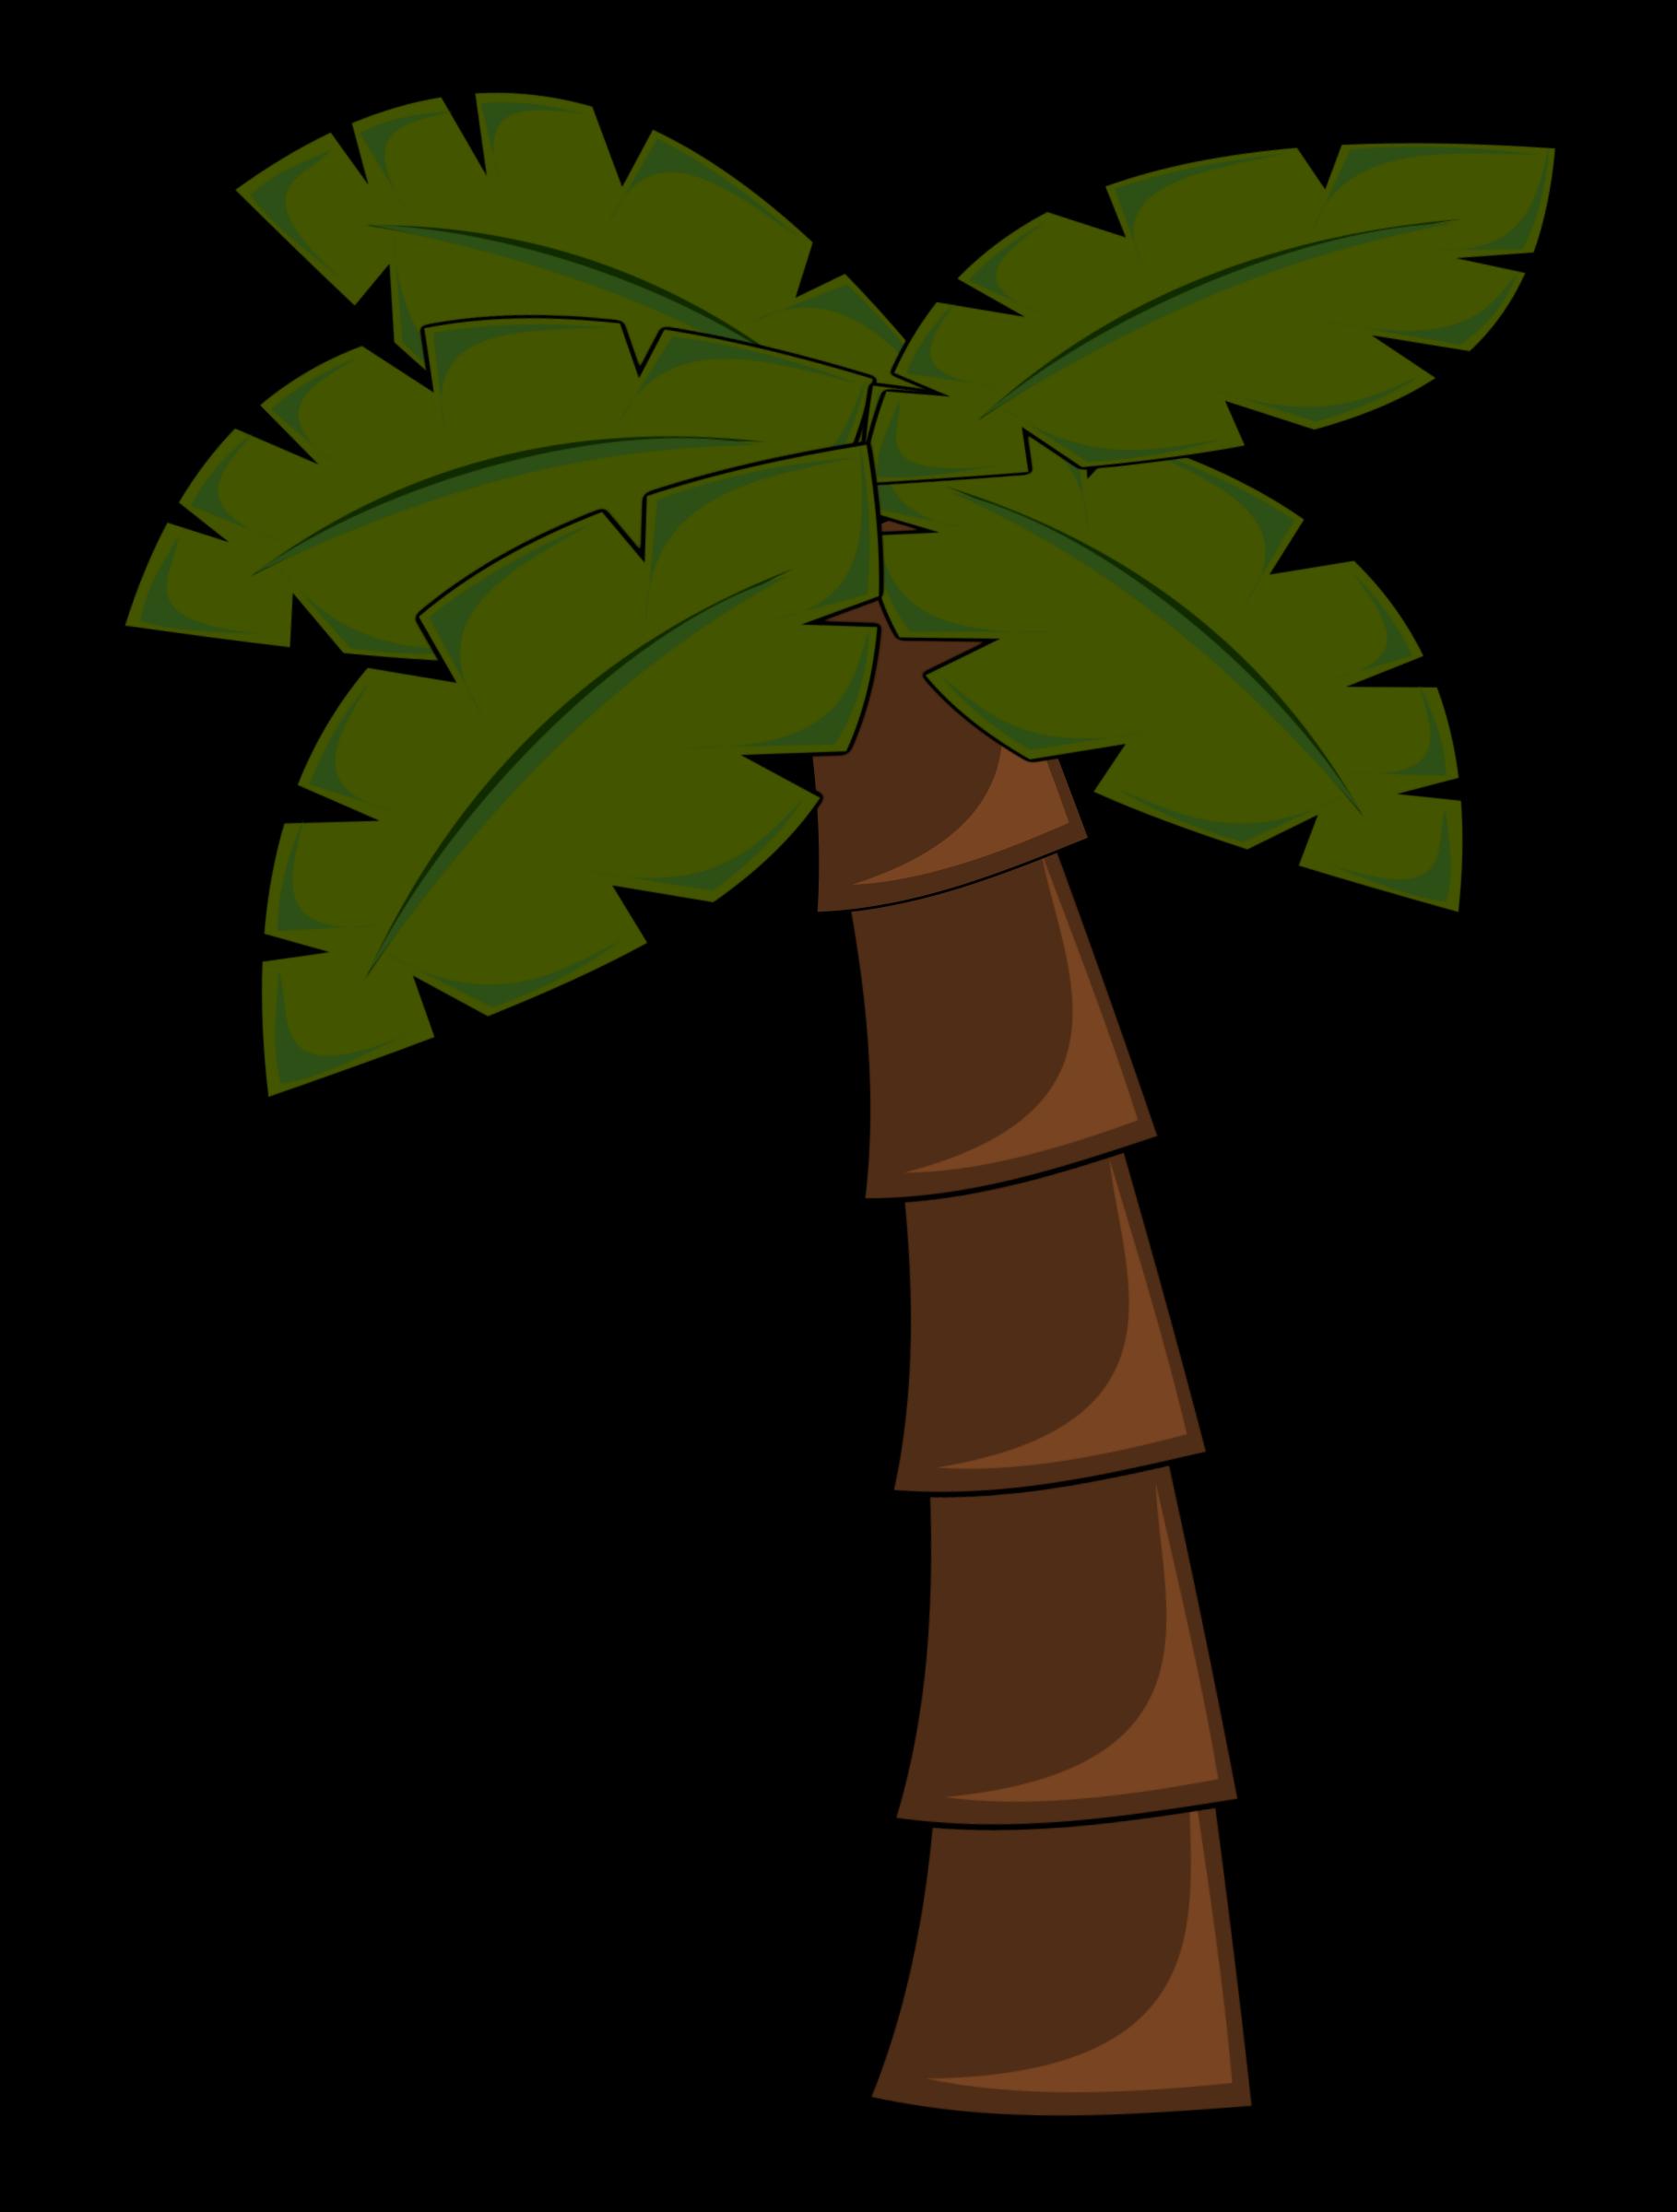 Palm tree big image. Clipart trees monkey